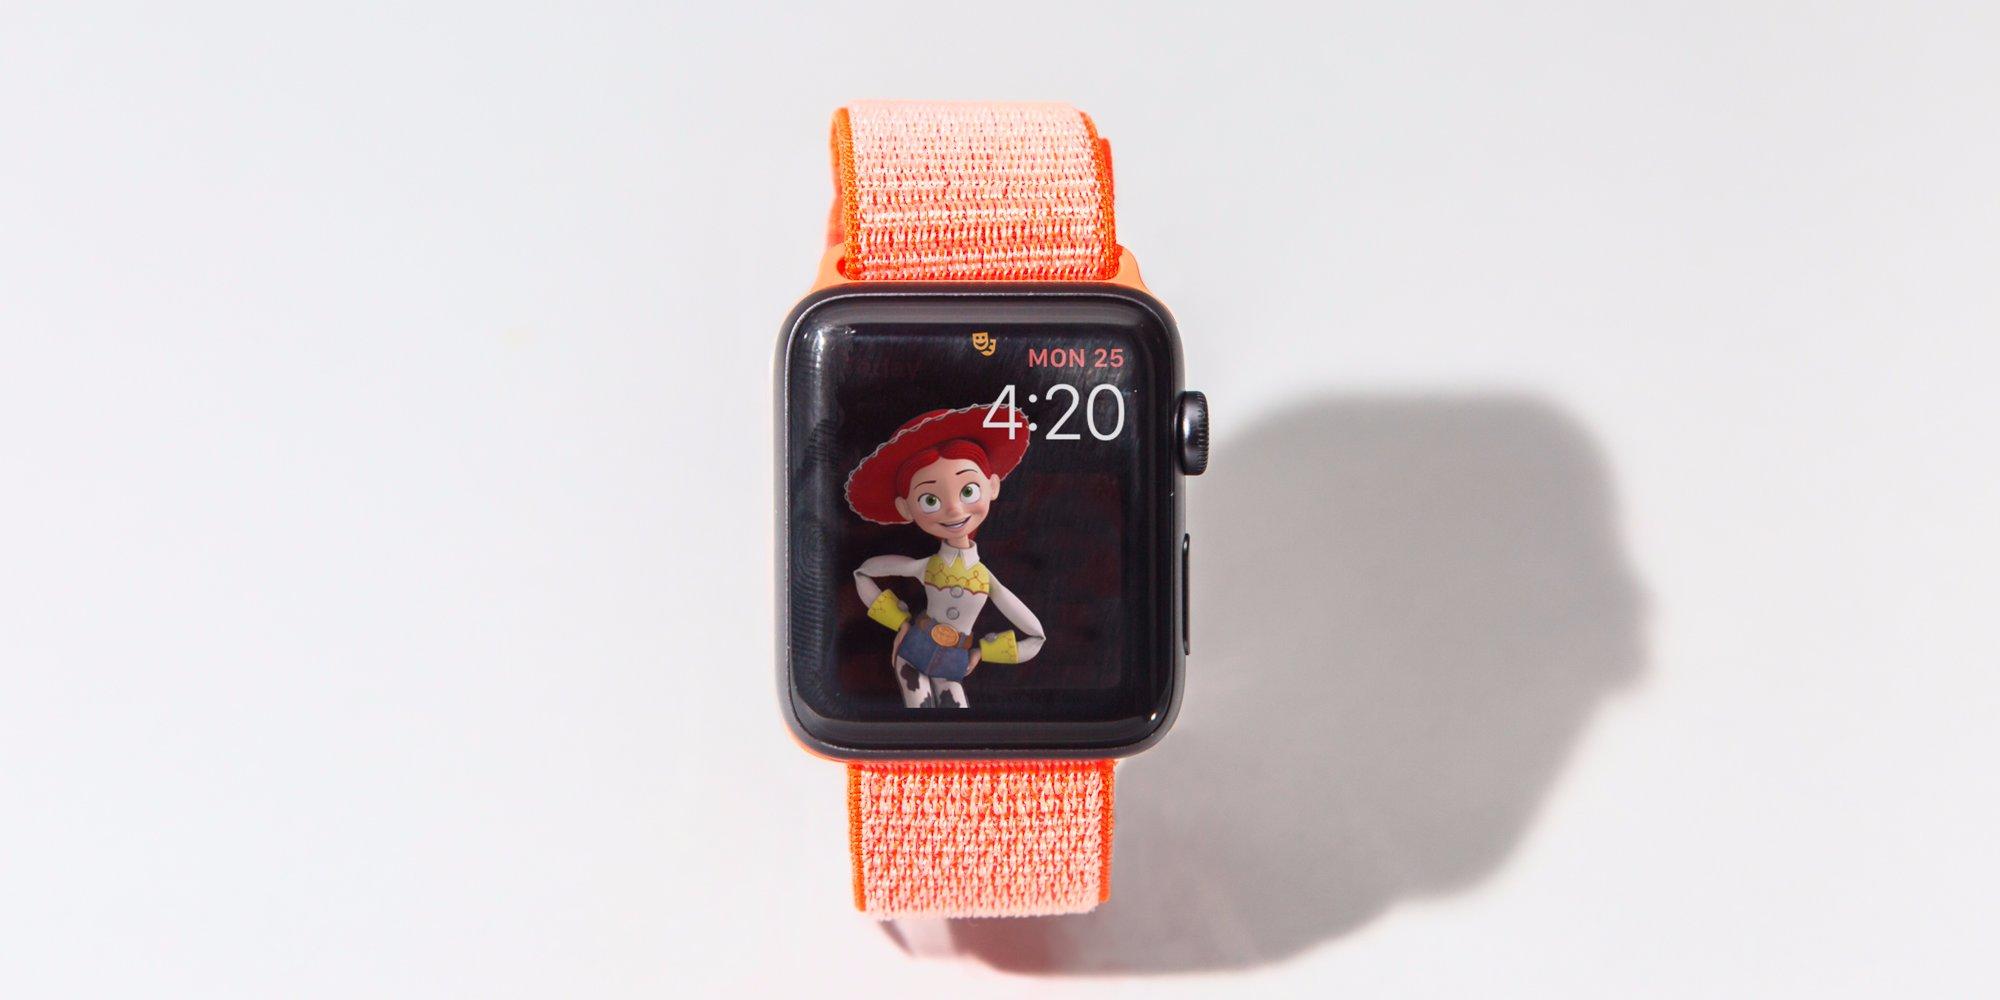 Apple Watch Hollis Johnson